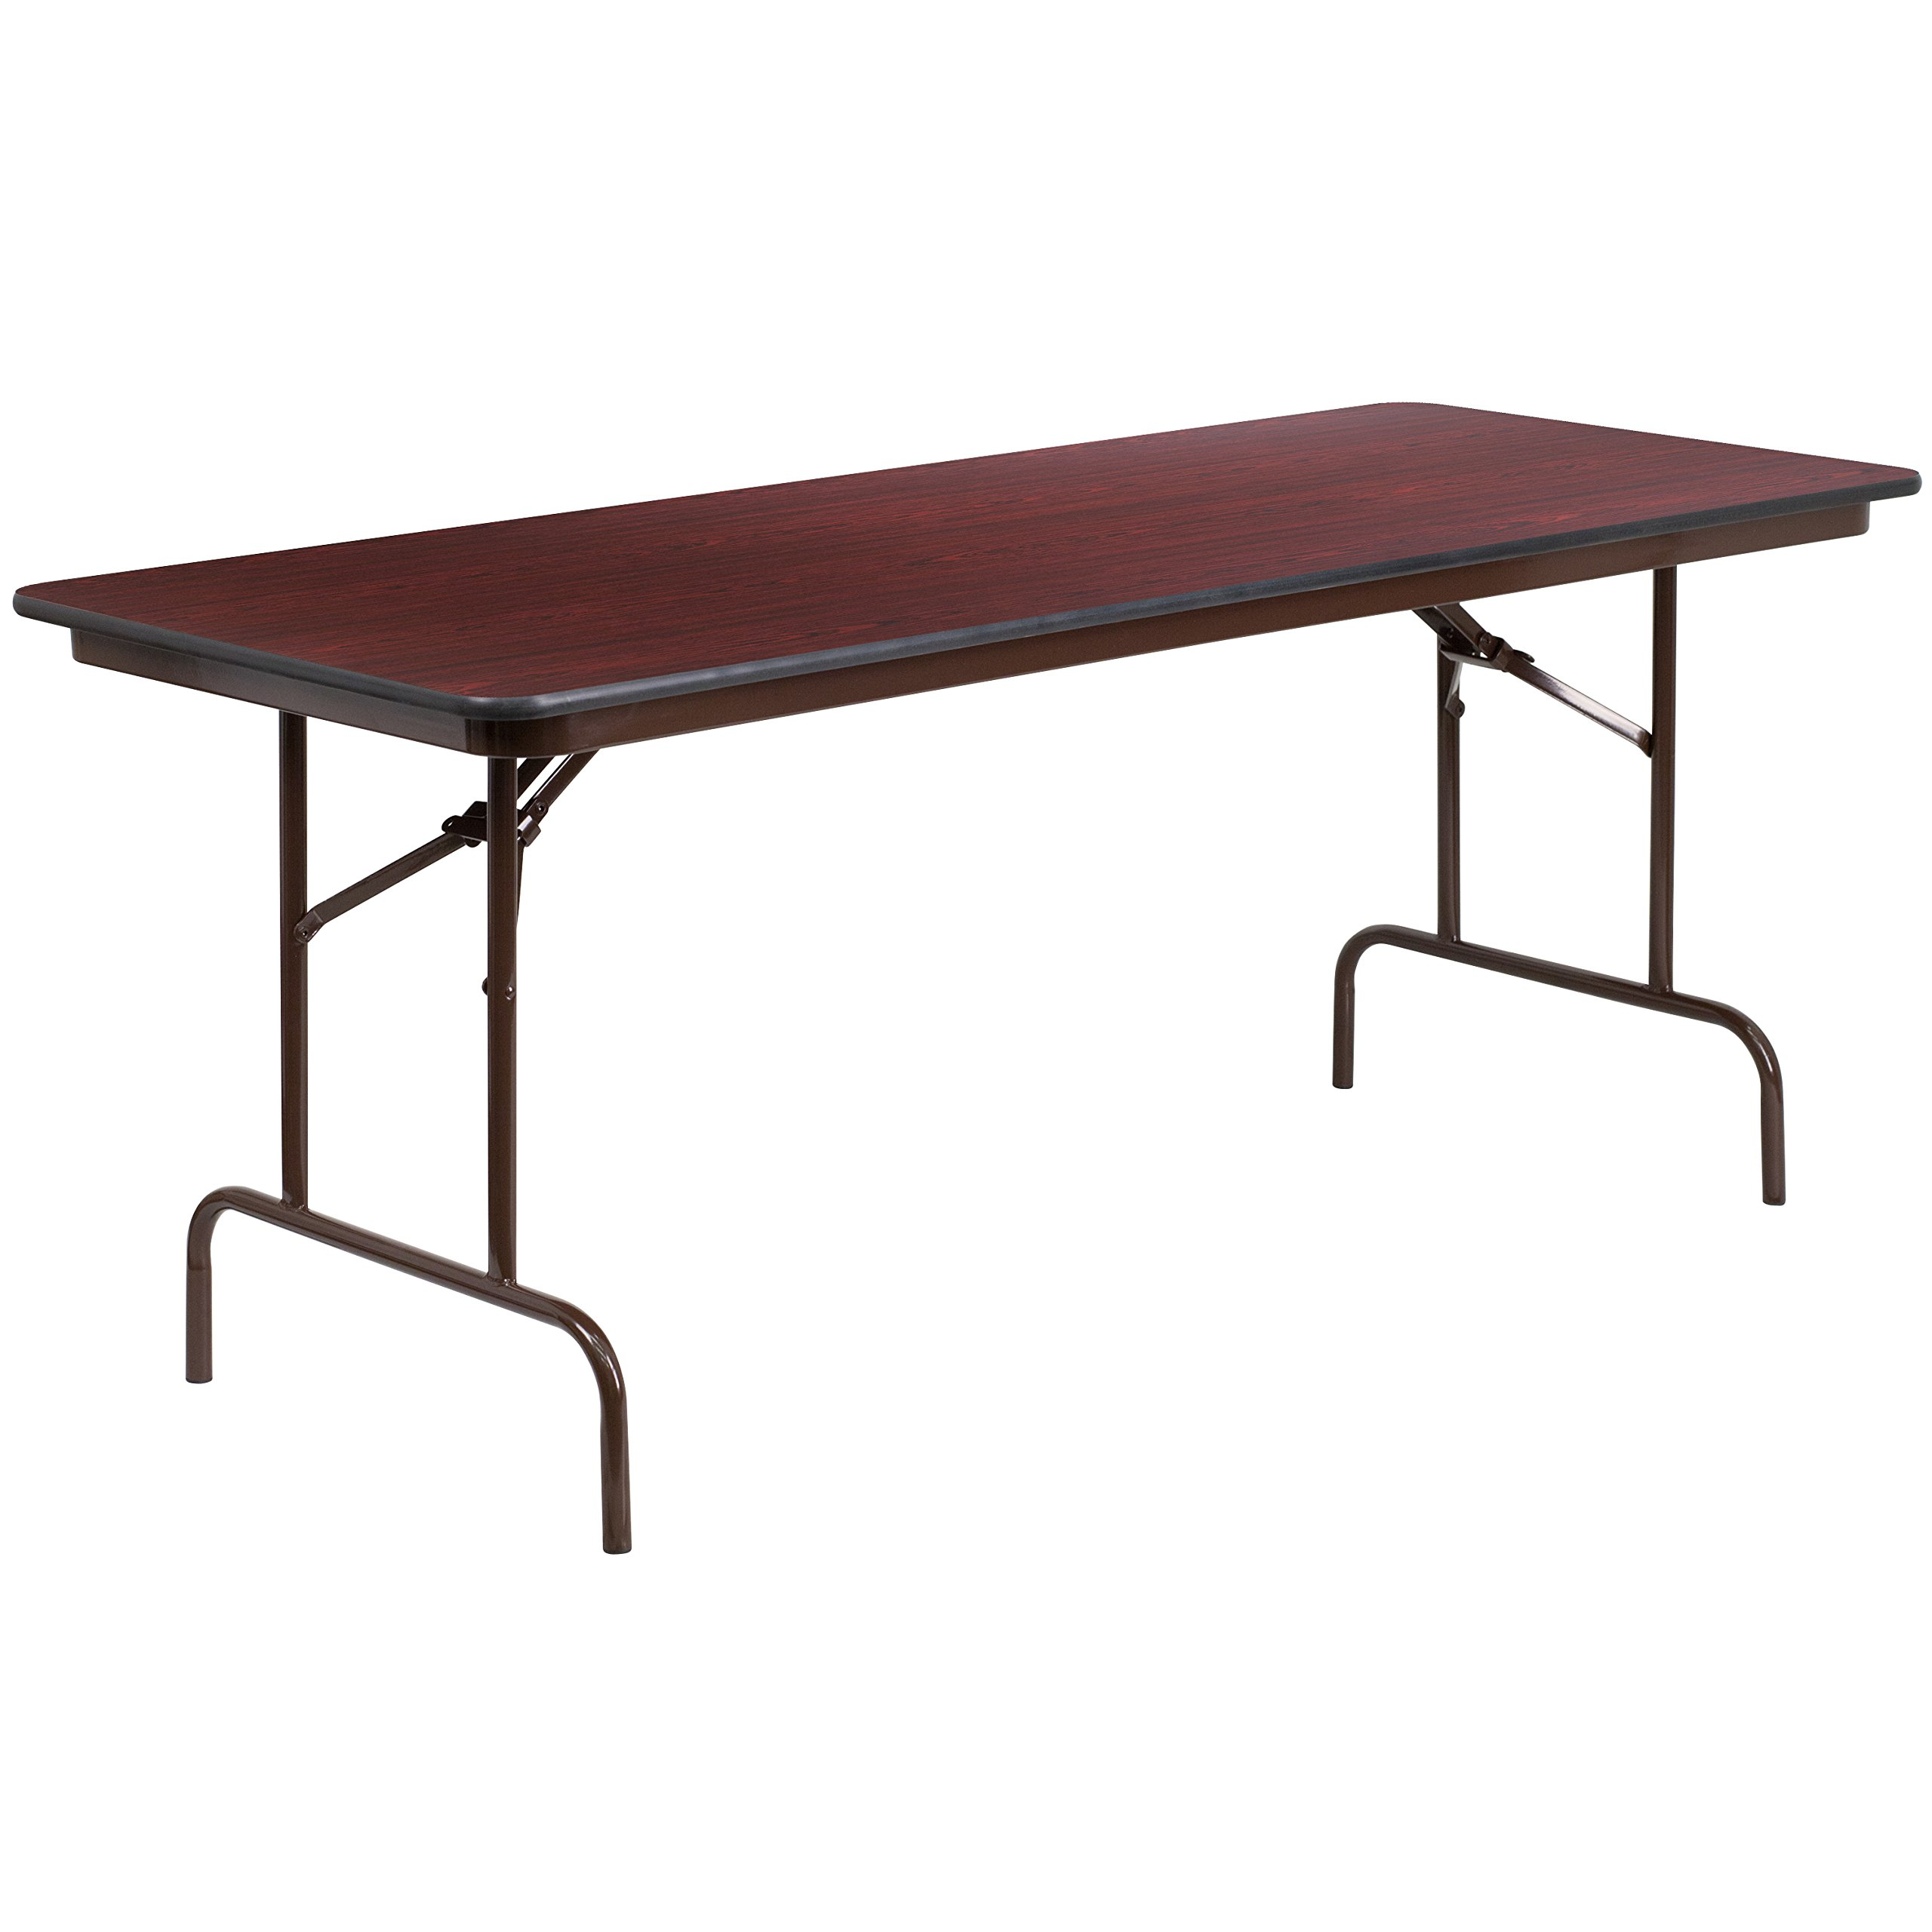 Flash Furniture 30'' x 72'' Rectangular High Pressure Mahogany Laminate Folding Banquet Table by Flash Furniture (Image #1)